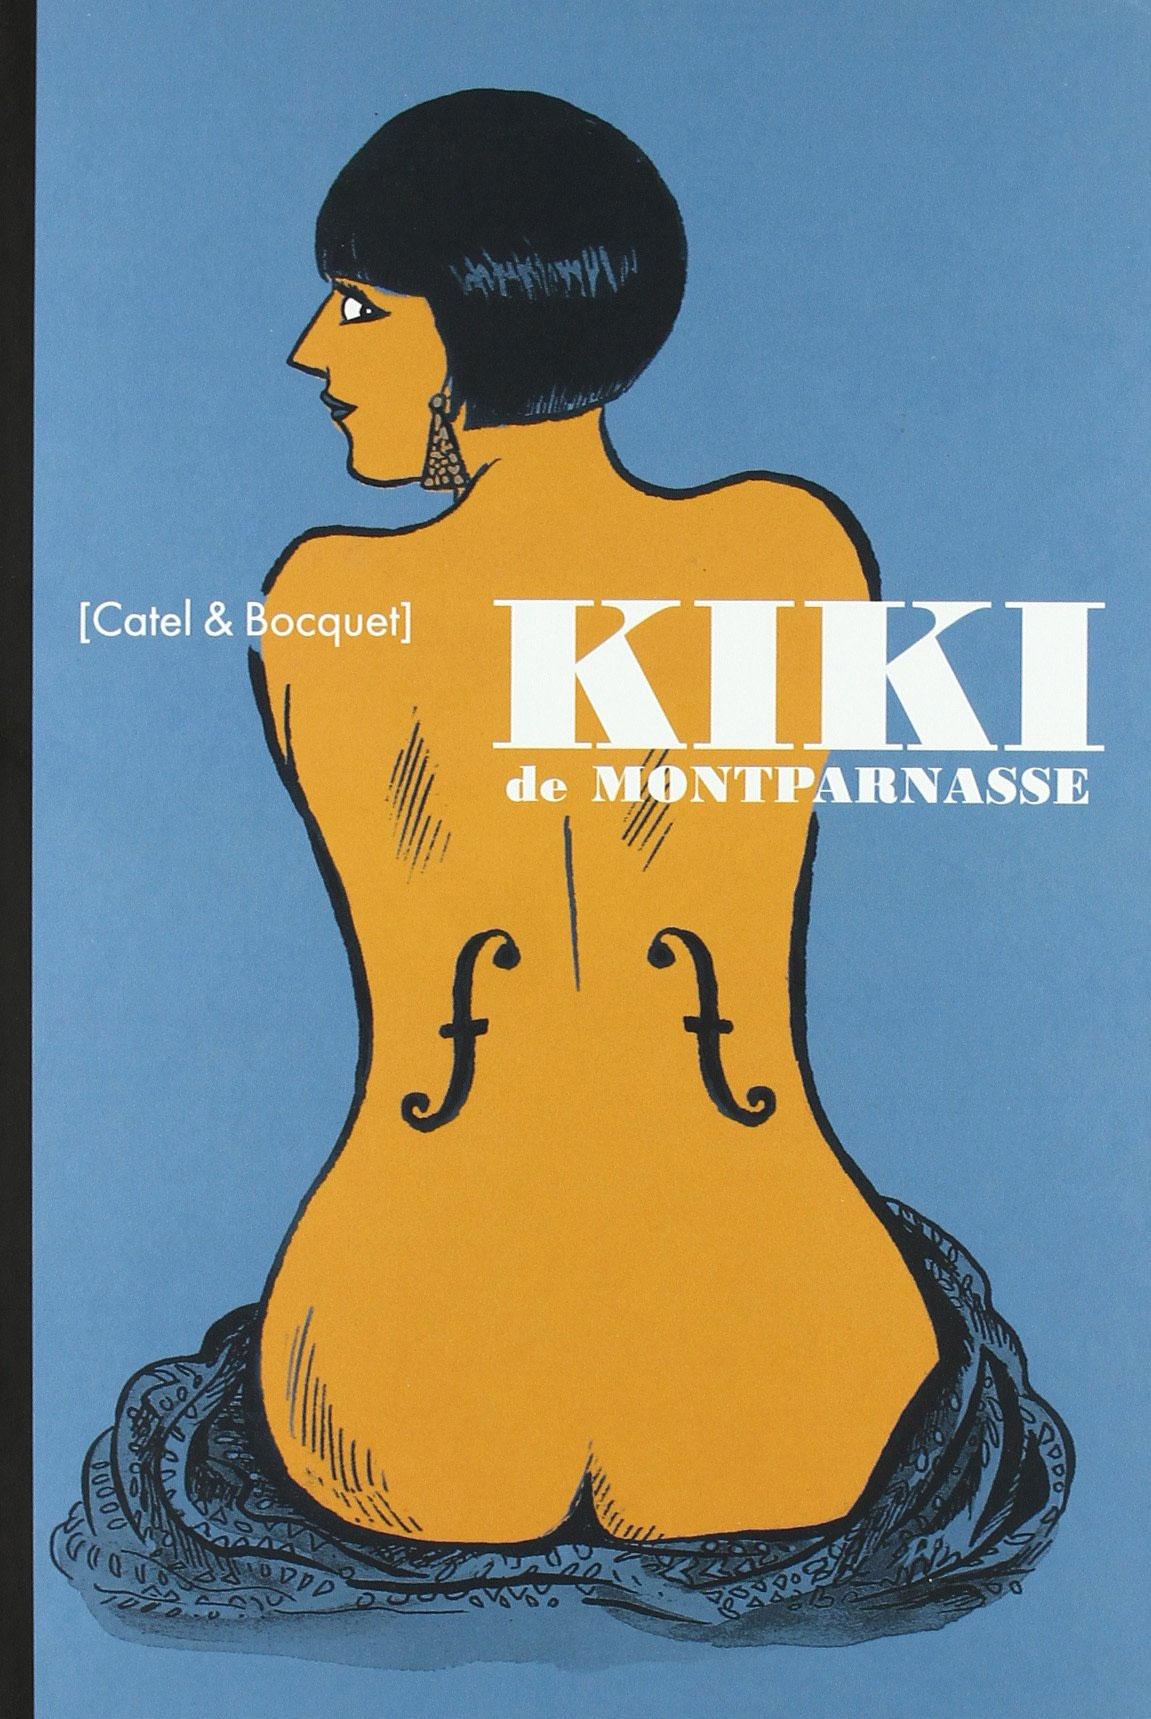 Kiki de Montparnasse - Catel & Bocquet